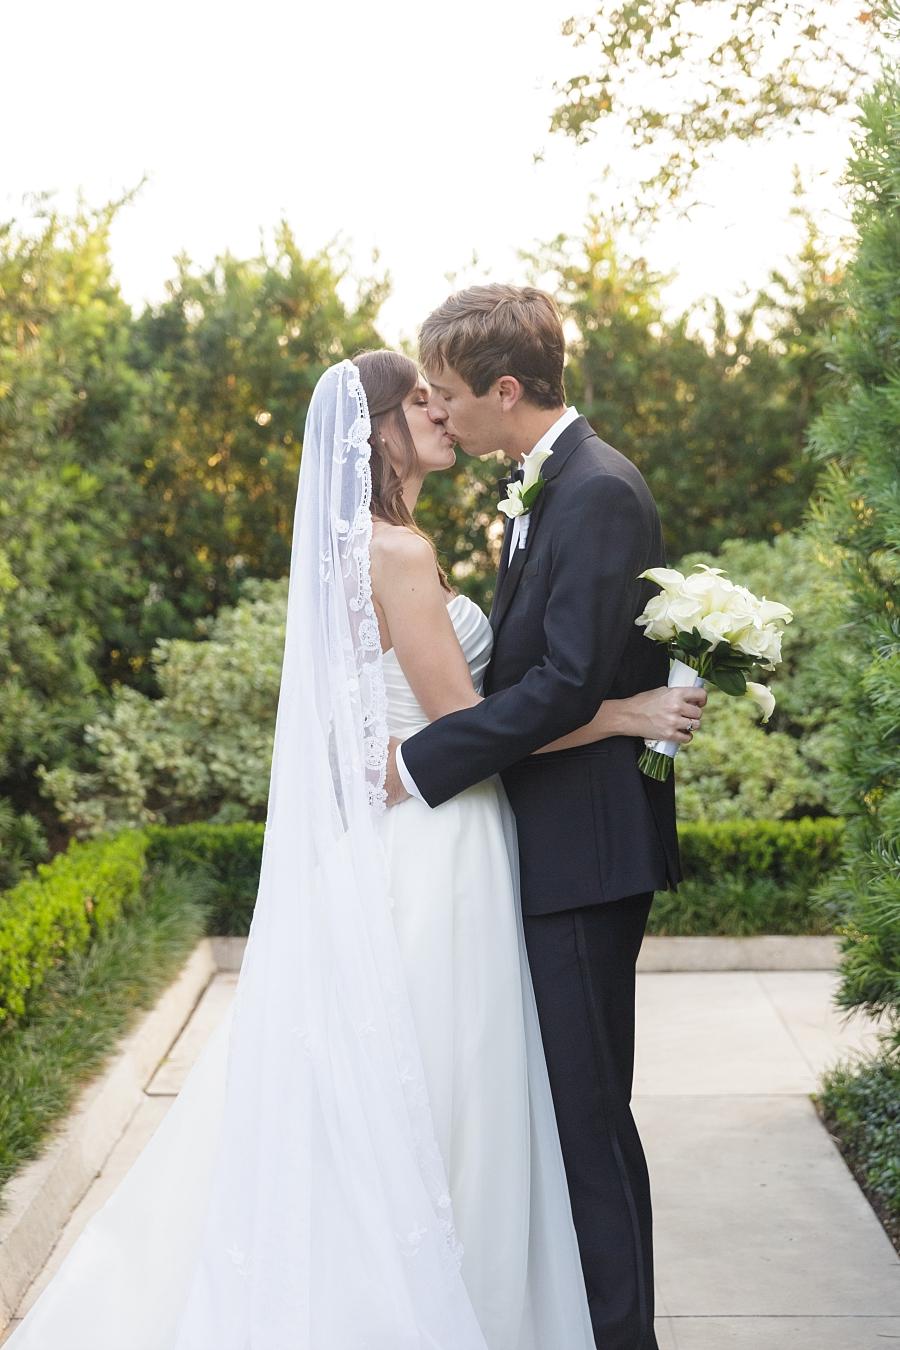 Stacy-Anderson-Photography-McGovern-Centennial-Gardens-Houston-Wedding-Photographer_0056.jpg